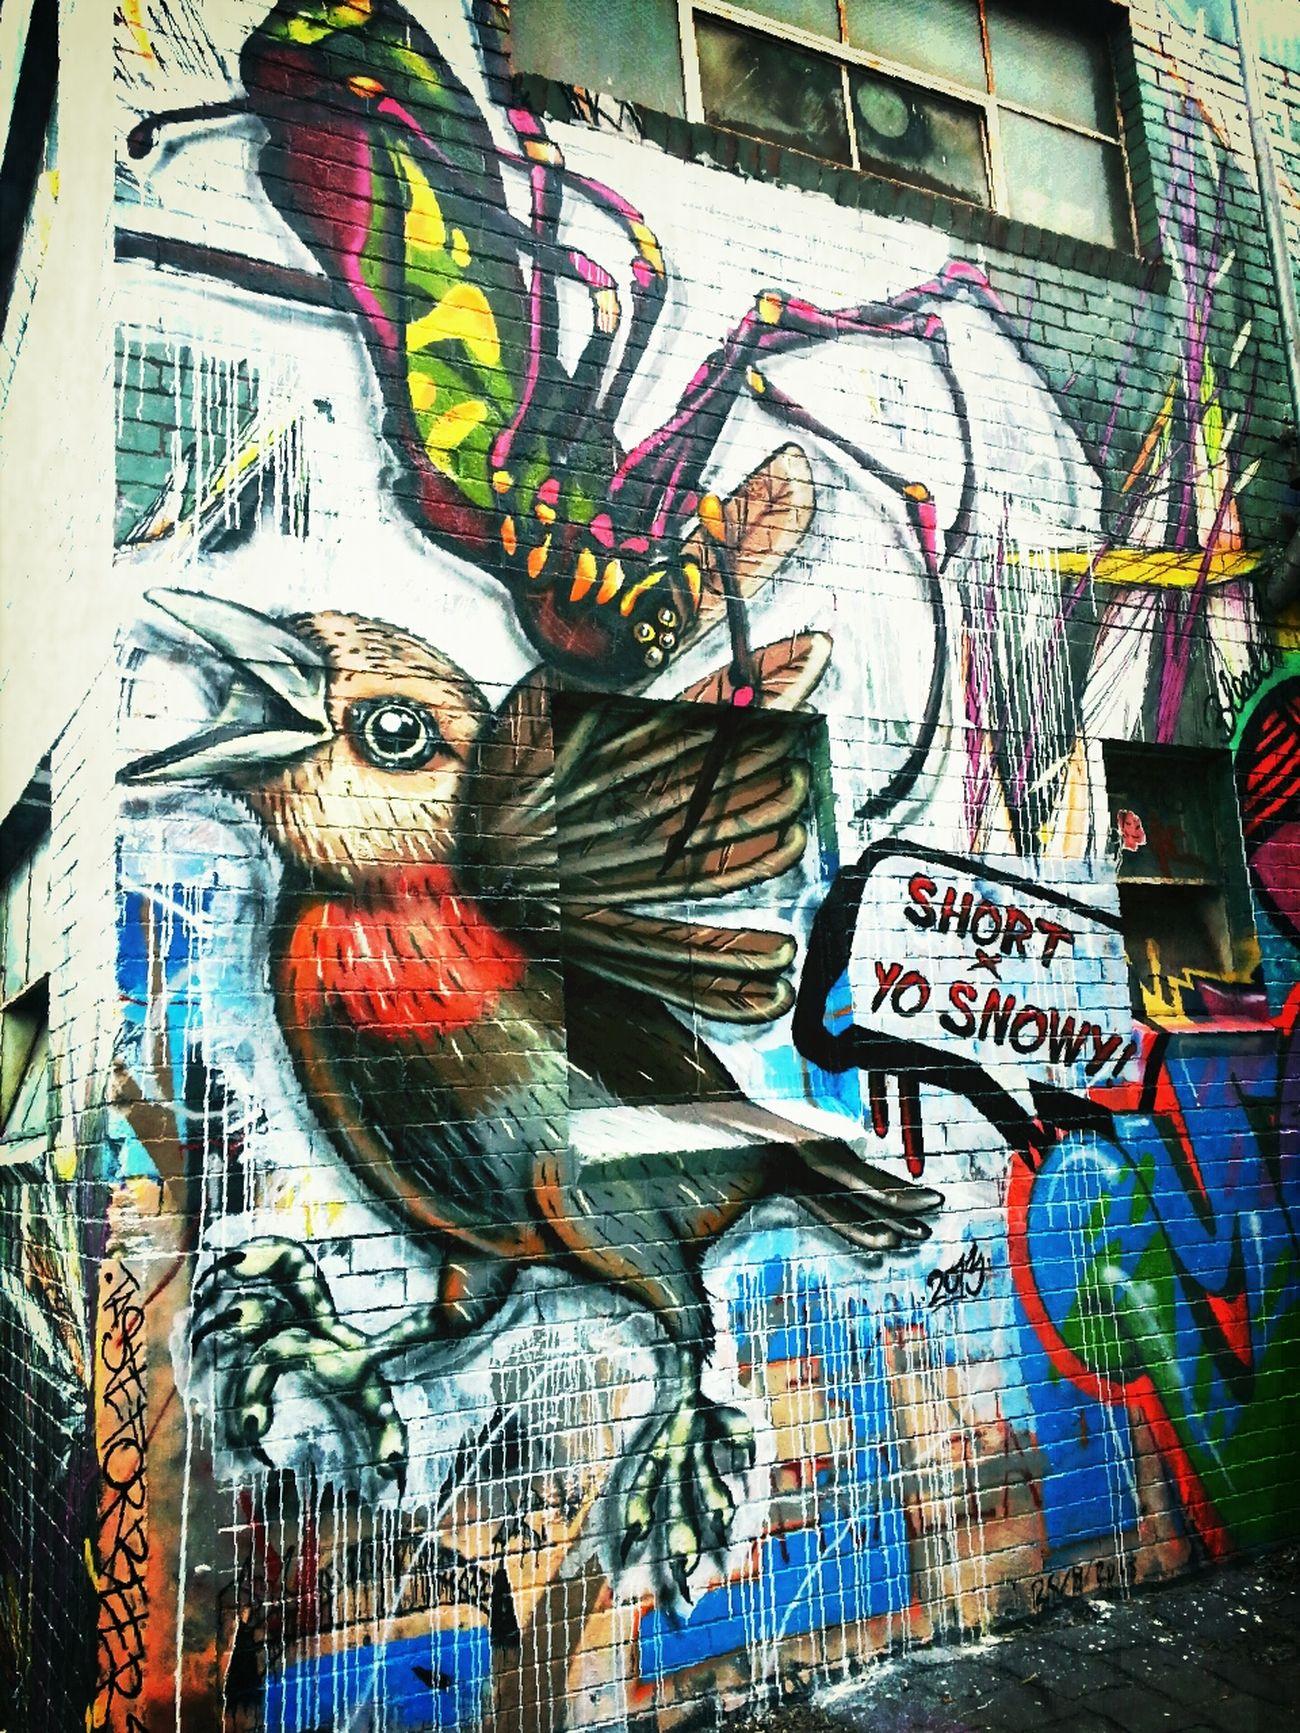 Snowy Boy red robin x short Spider Streetart in brunswick Melbourne Graffiti